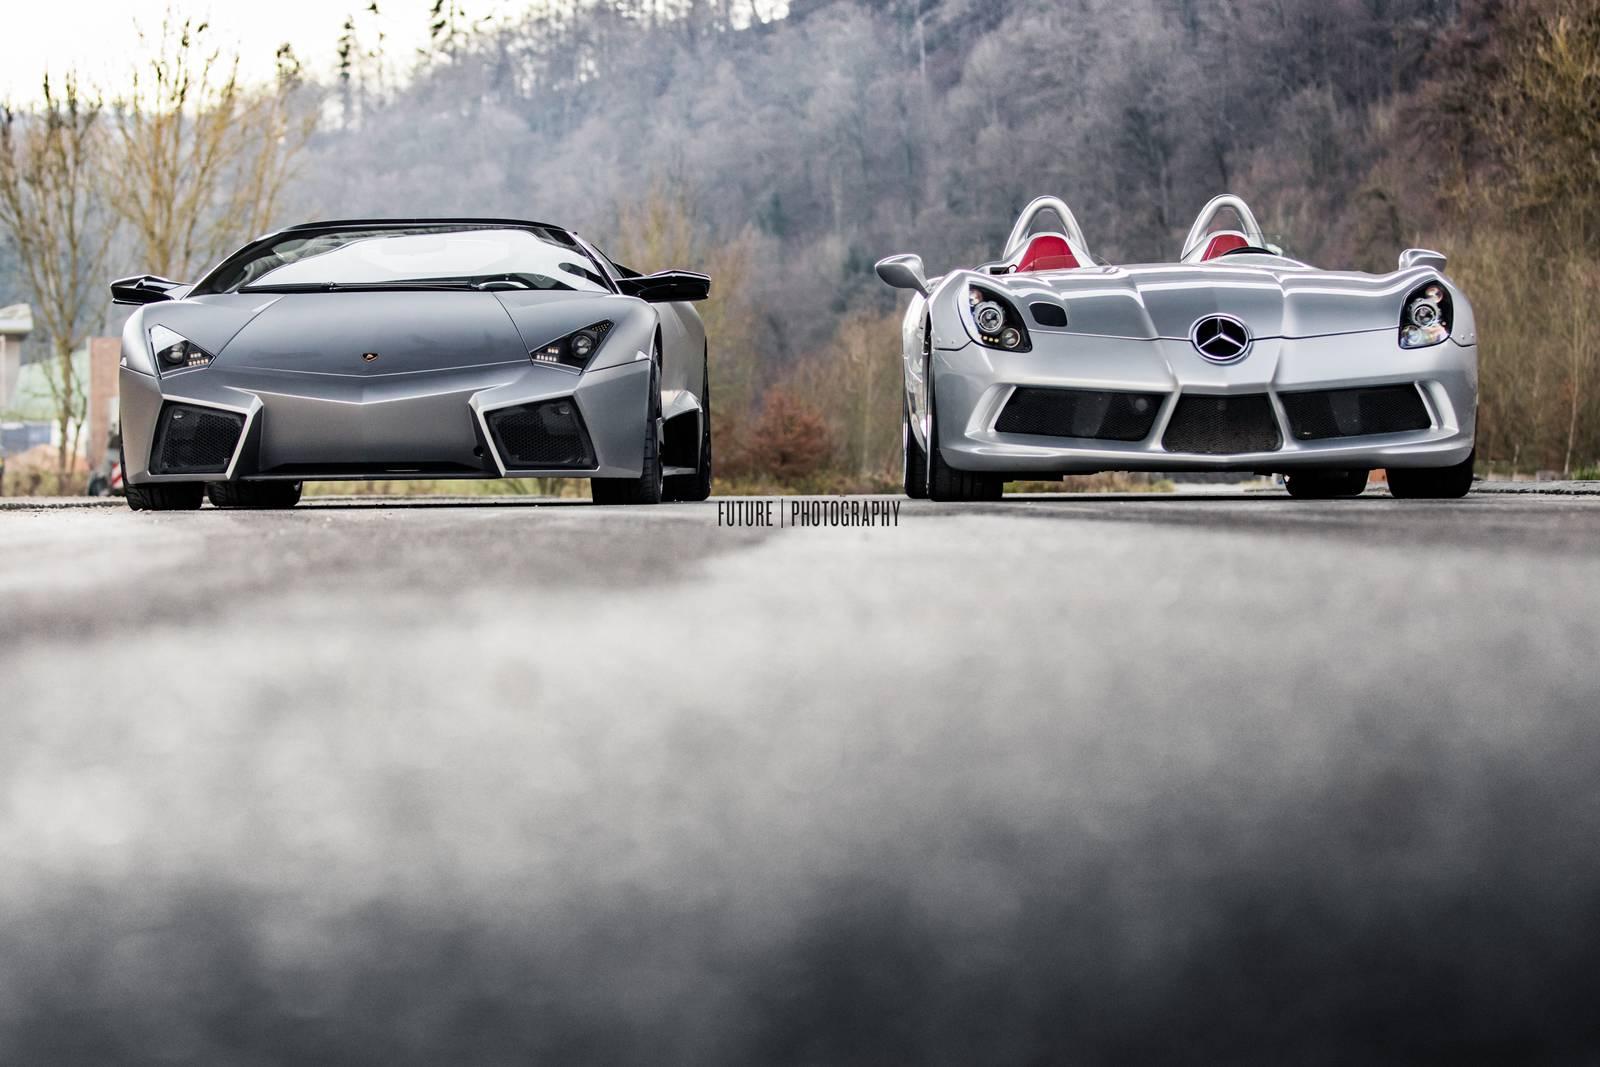 Lamborghini Reventon and SLR McLaren Stirling Moss